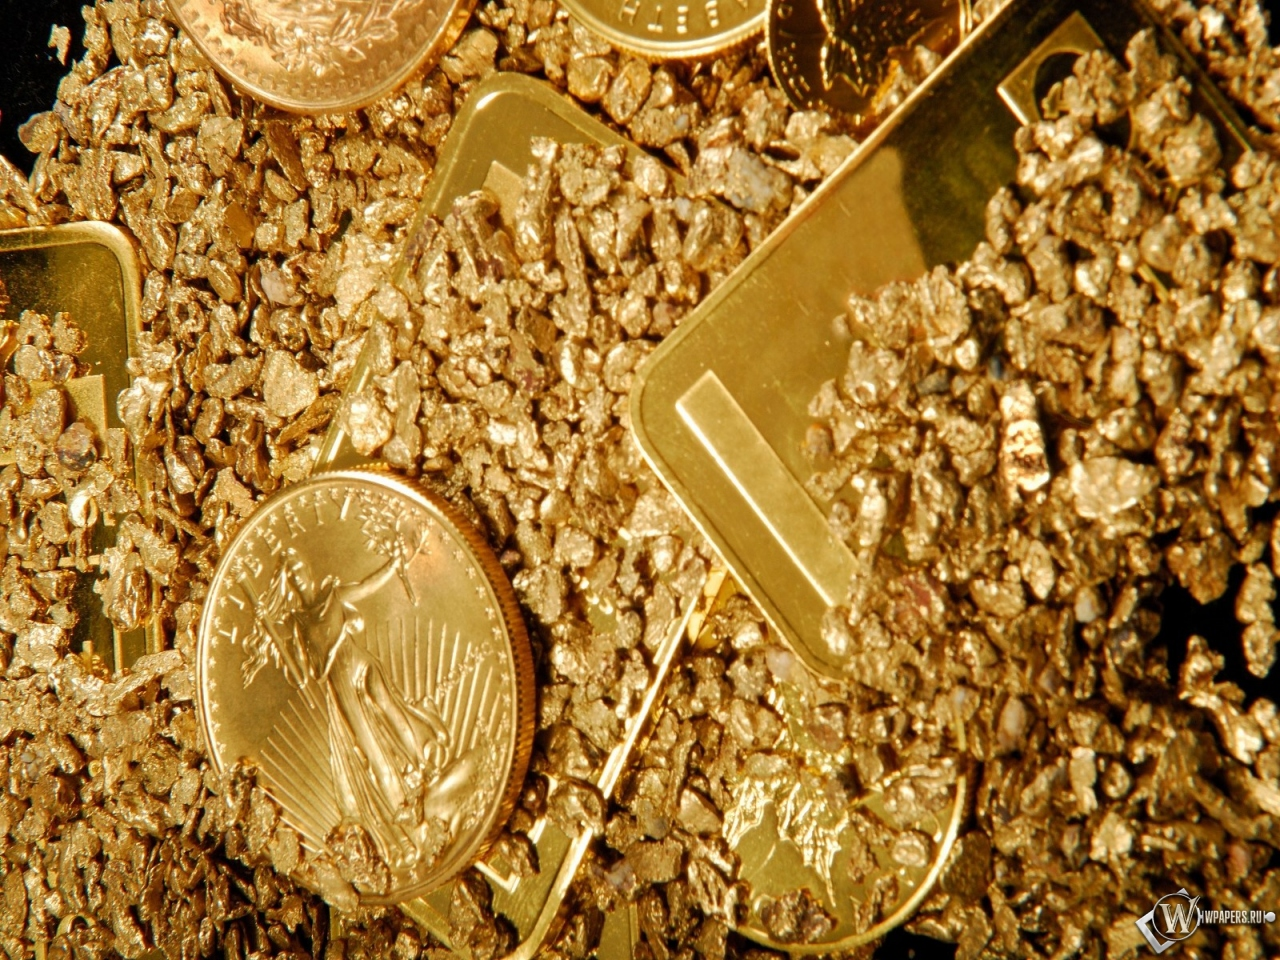 Монеты деньги монеты 1280x960 картинки